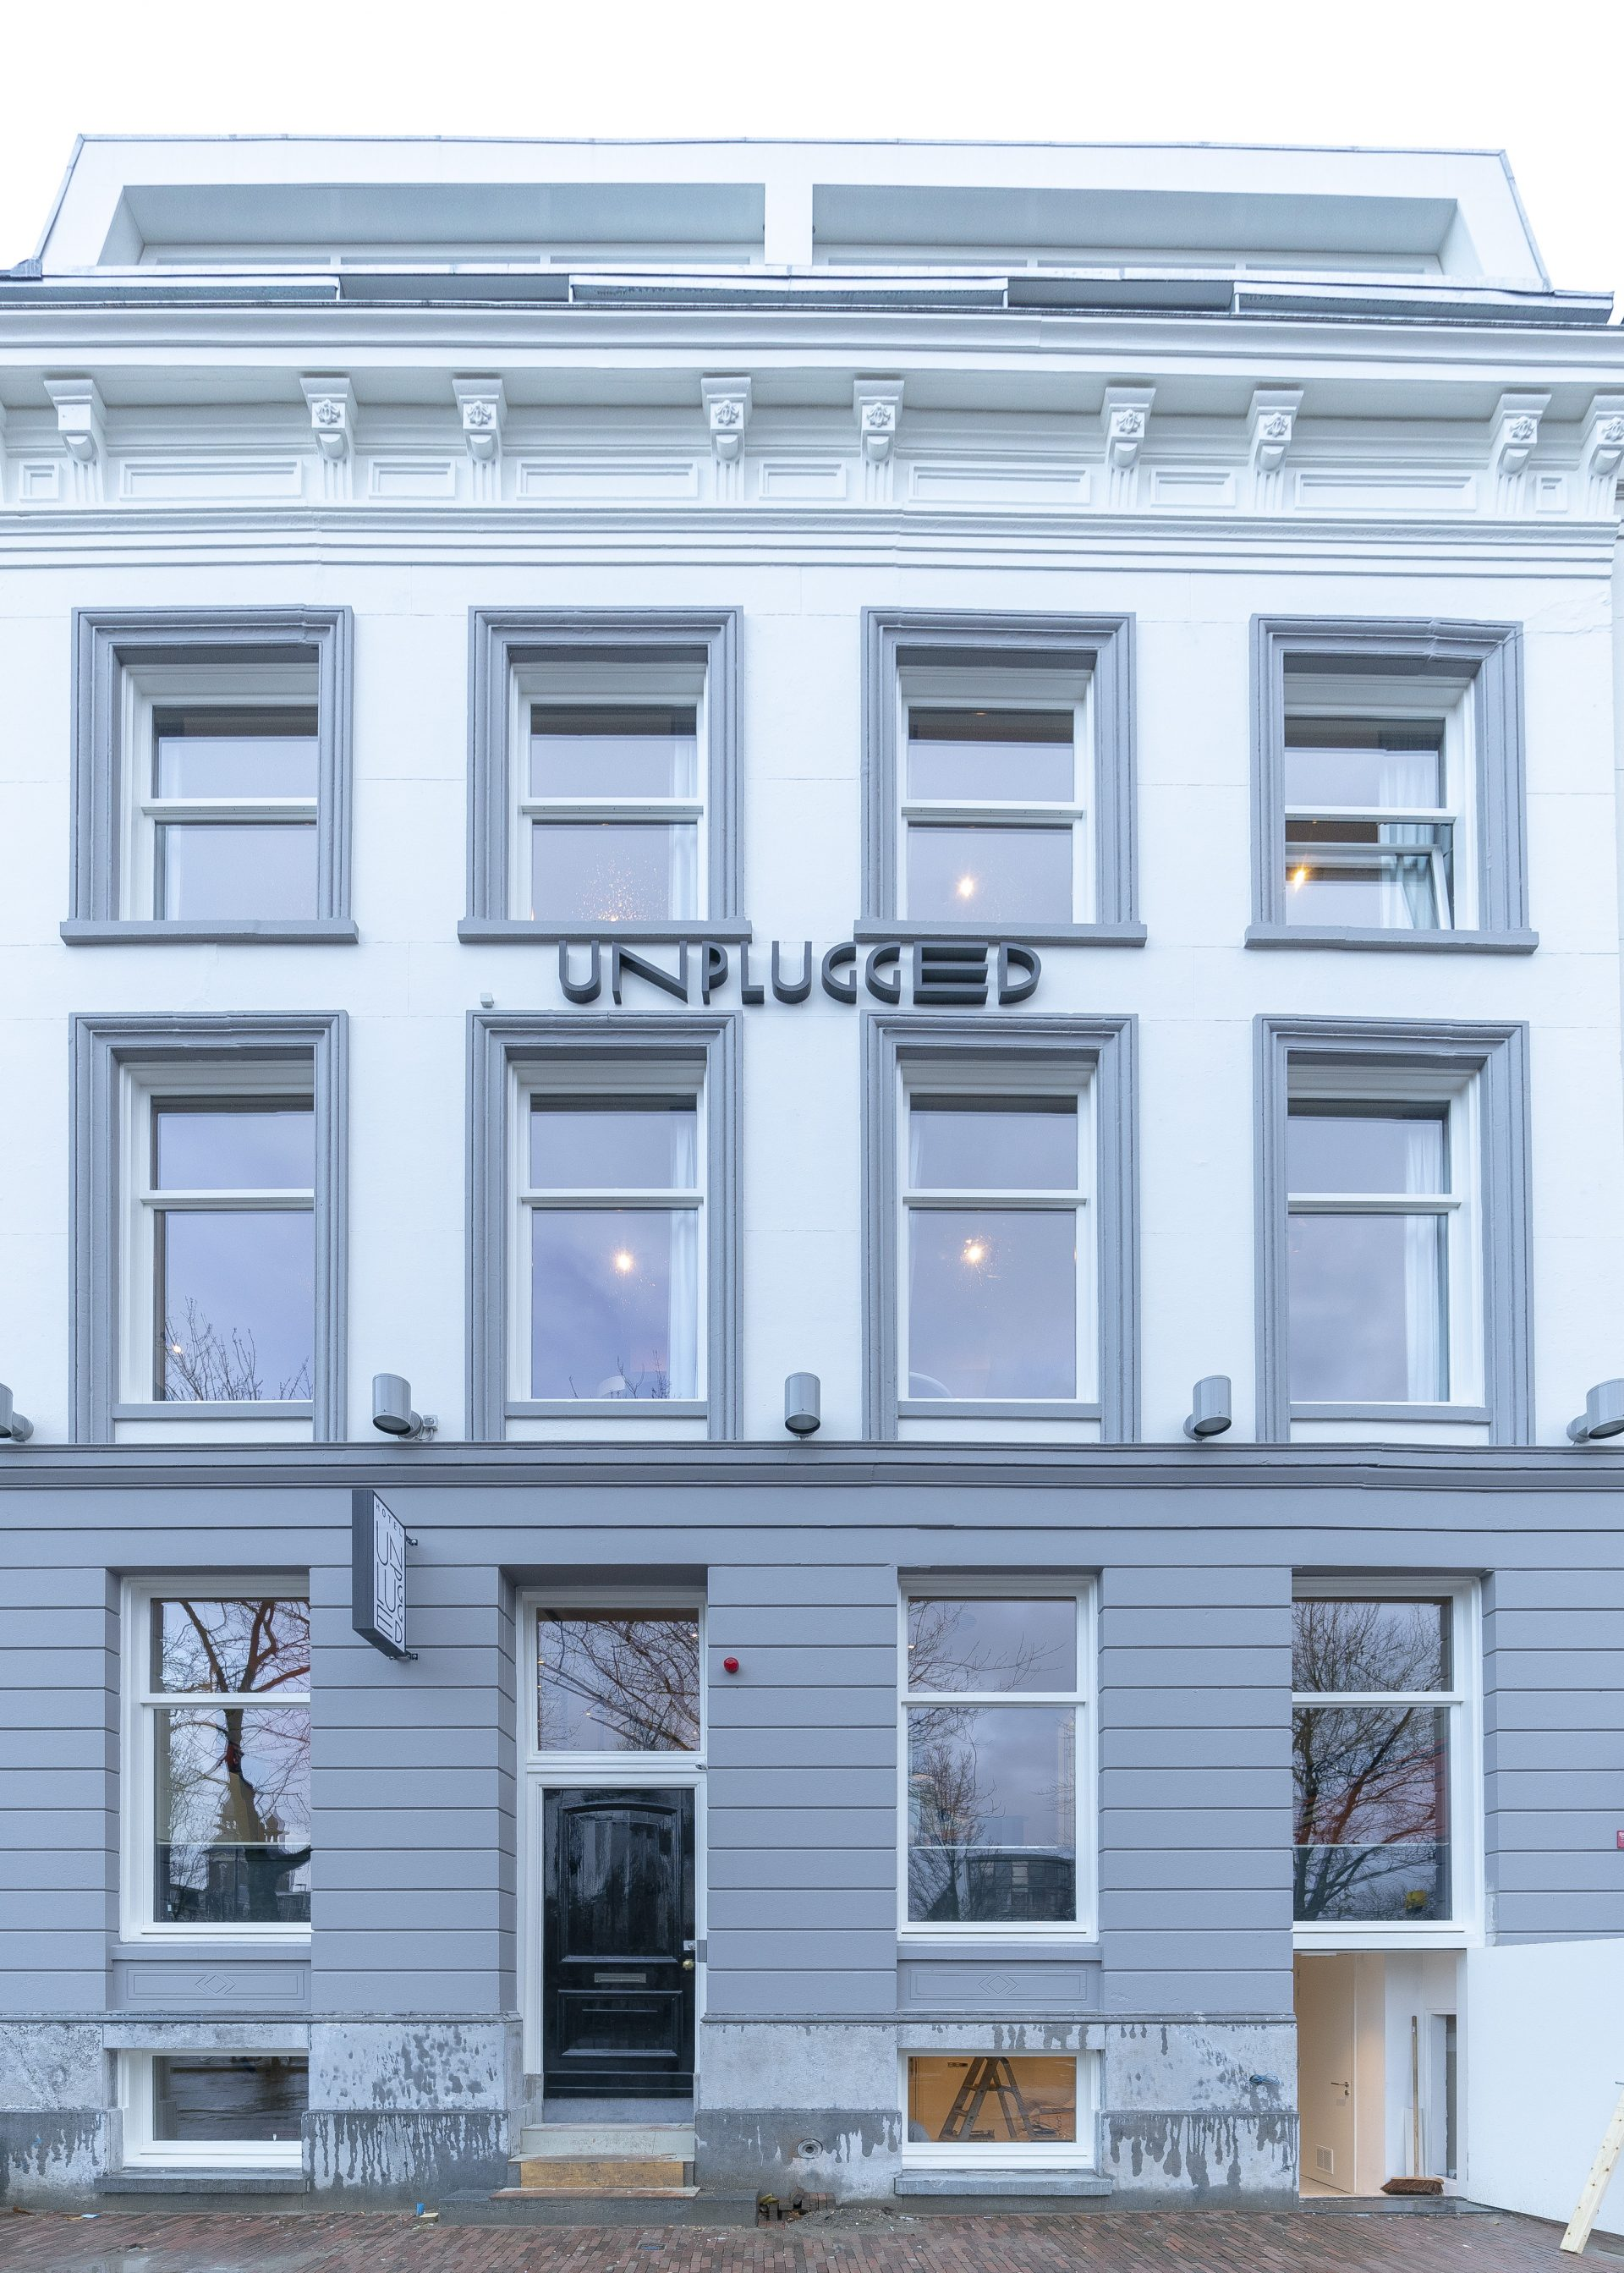 Hotel 'Unplugged' Eendrachtsplein, Rotterdam